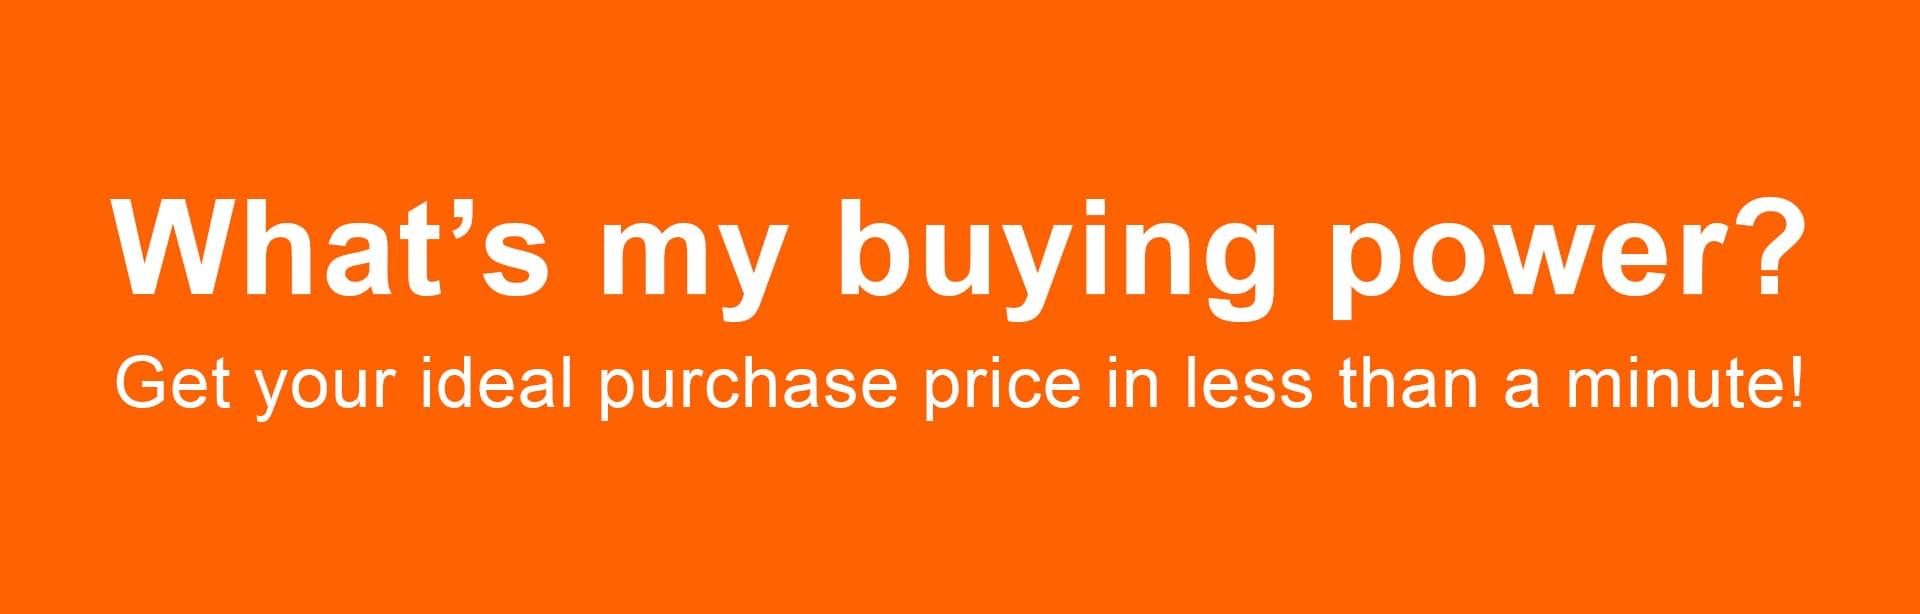 BuyingPower_1920x614